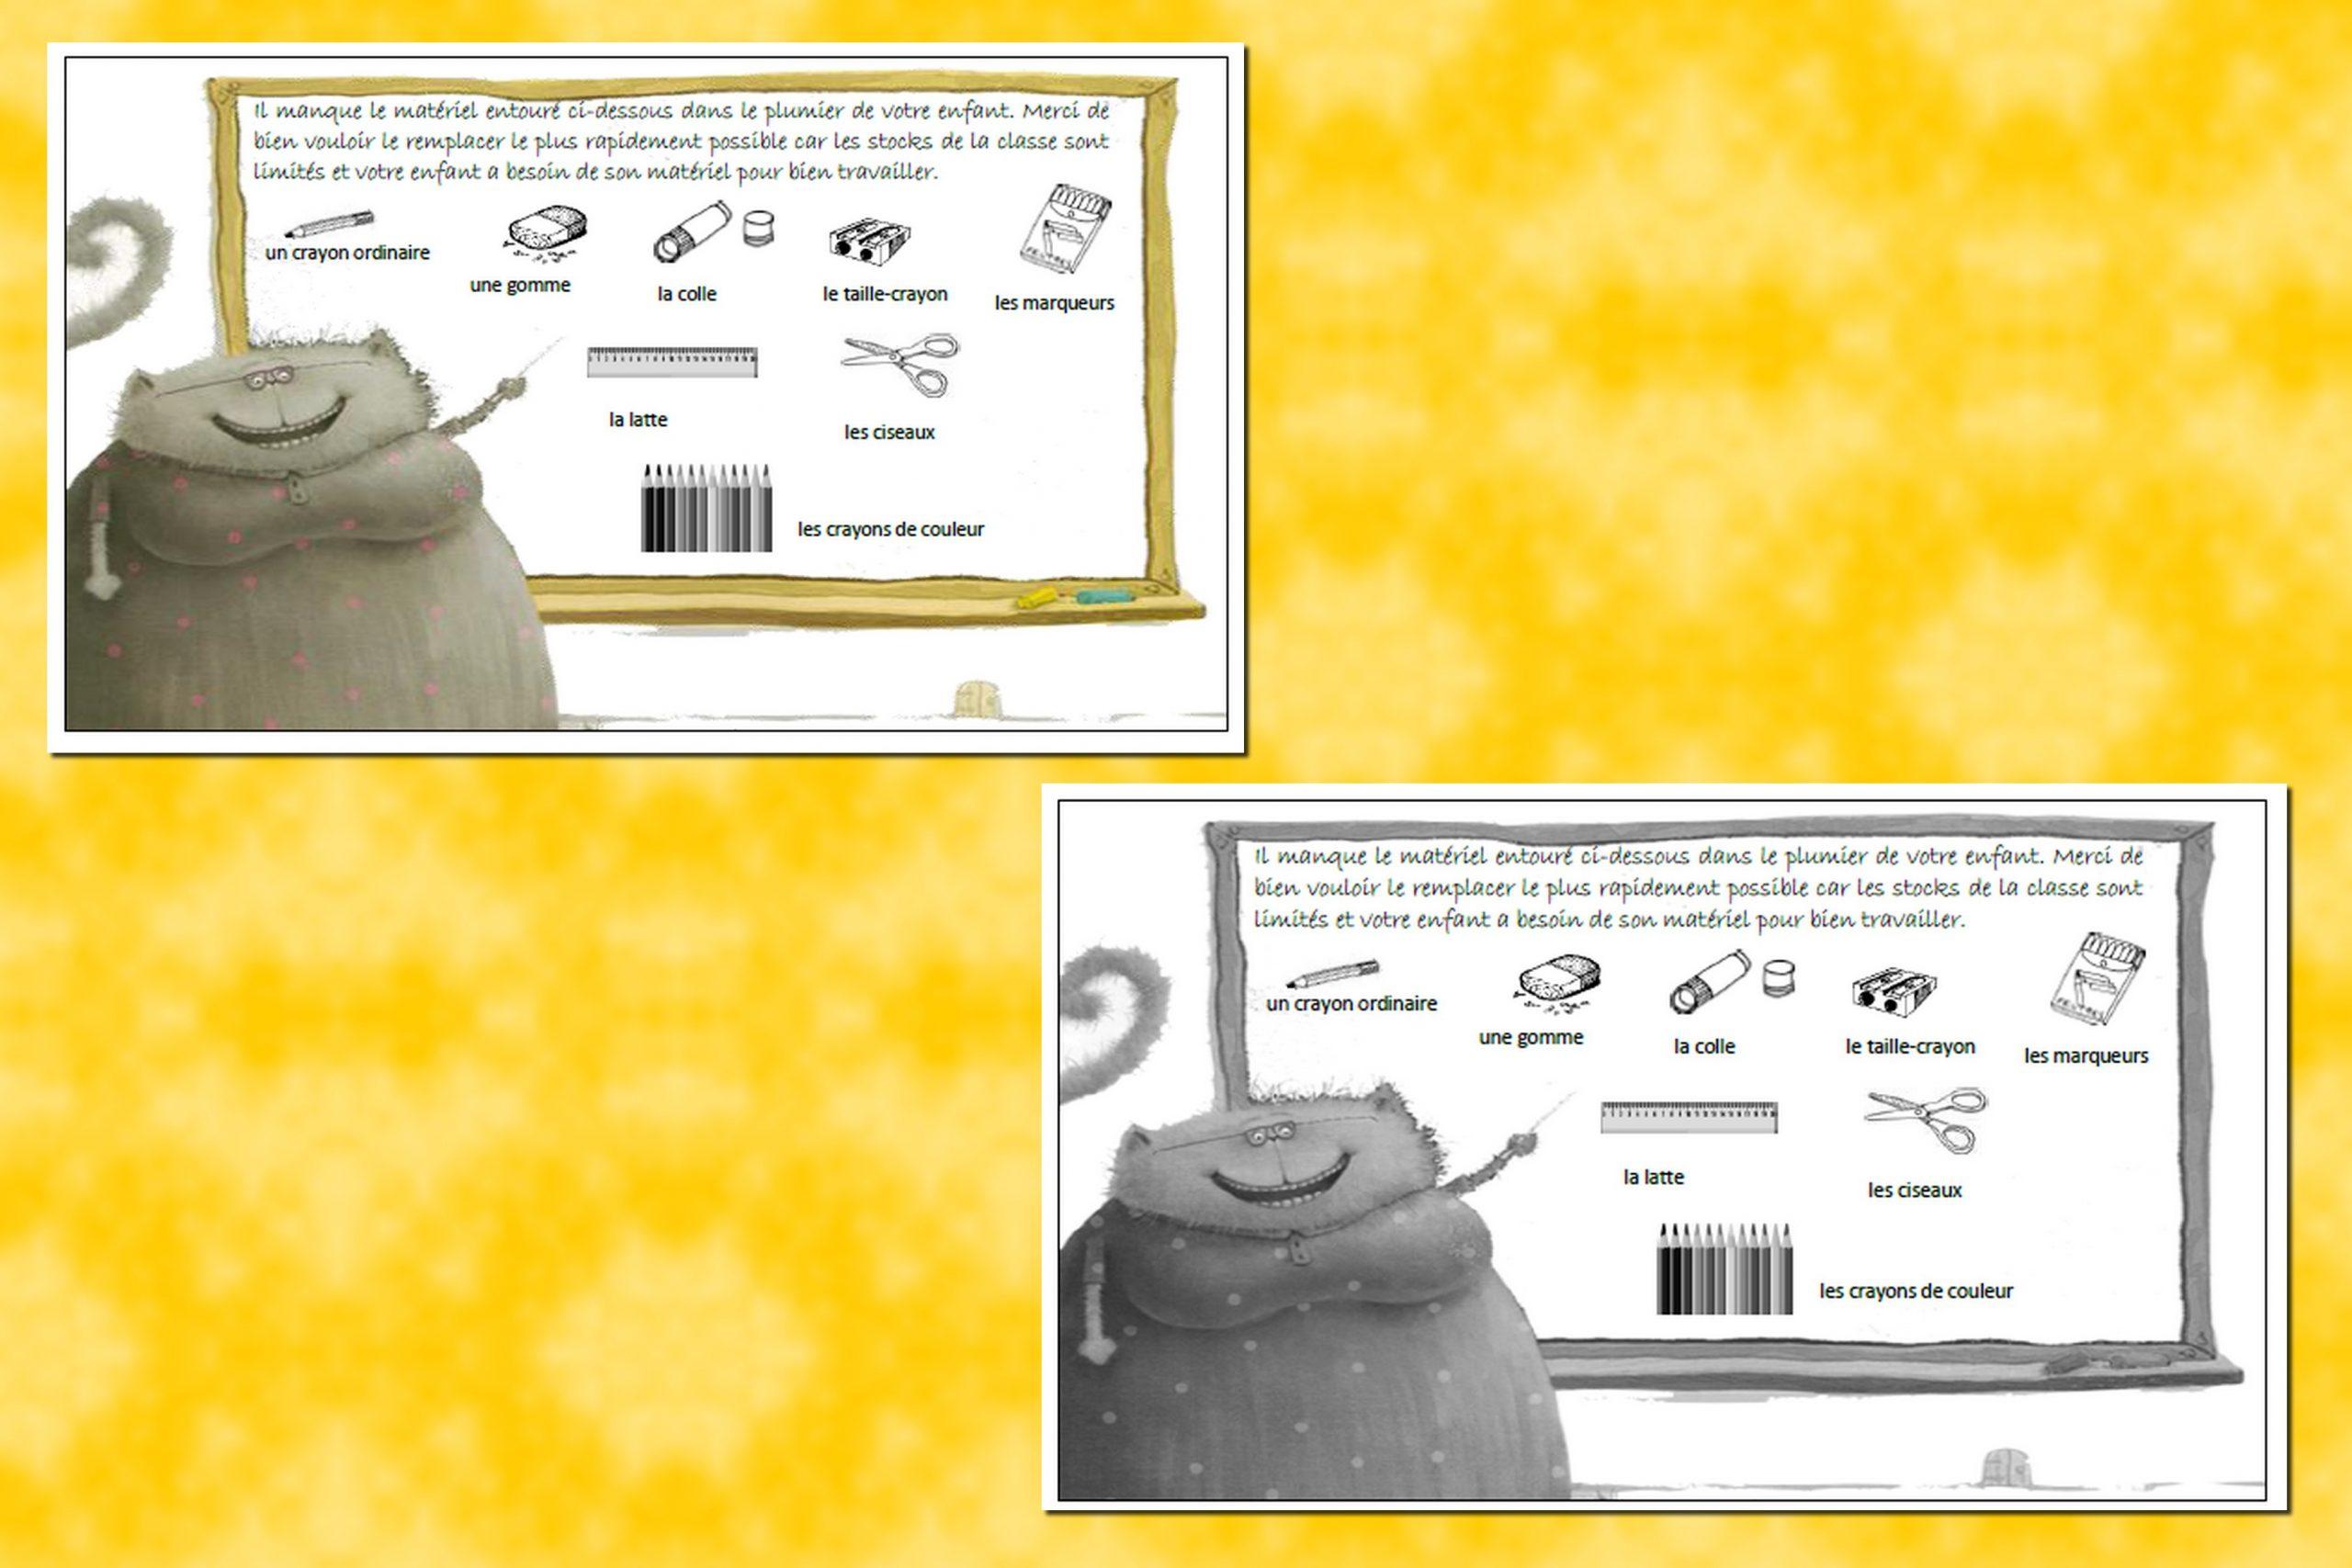 Billet Matériel Splat - Coraliecaramel concernant Billet A Imprimer